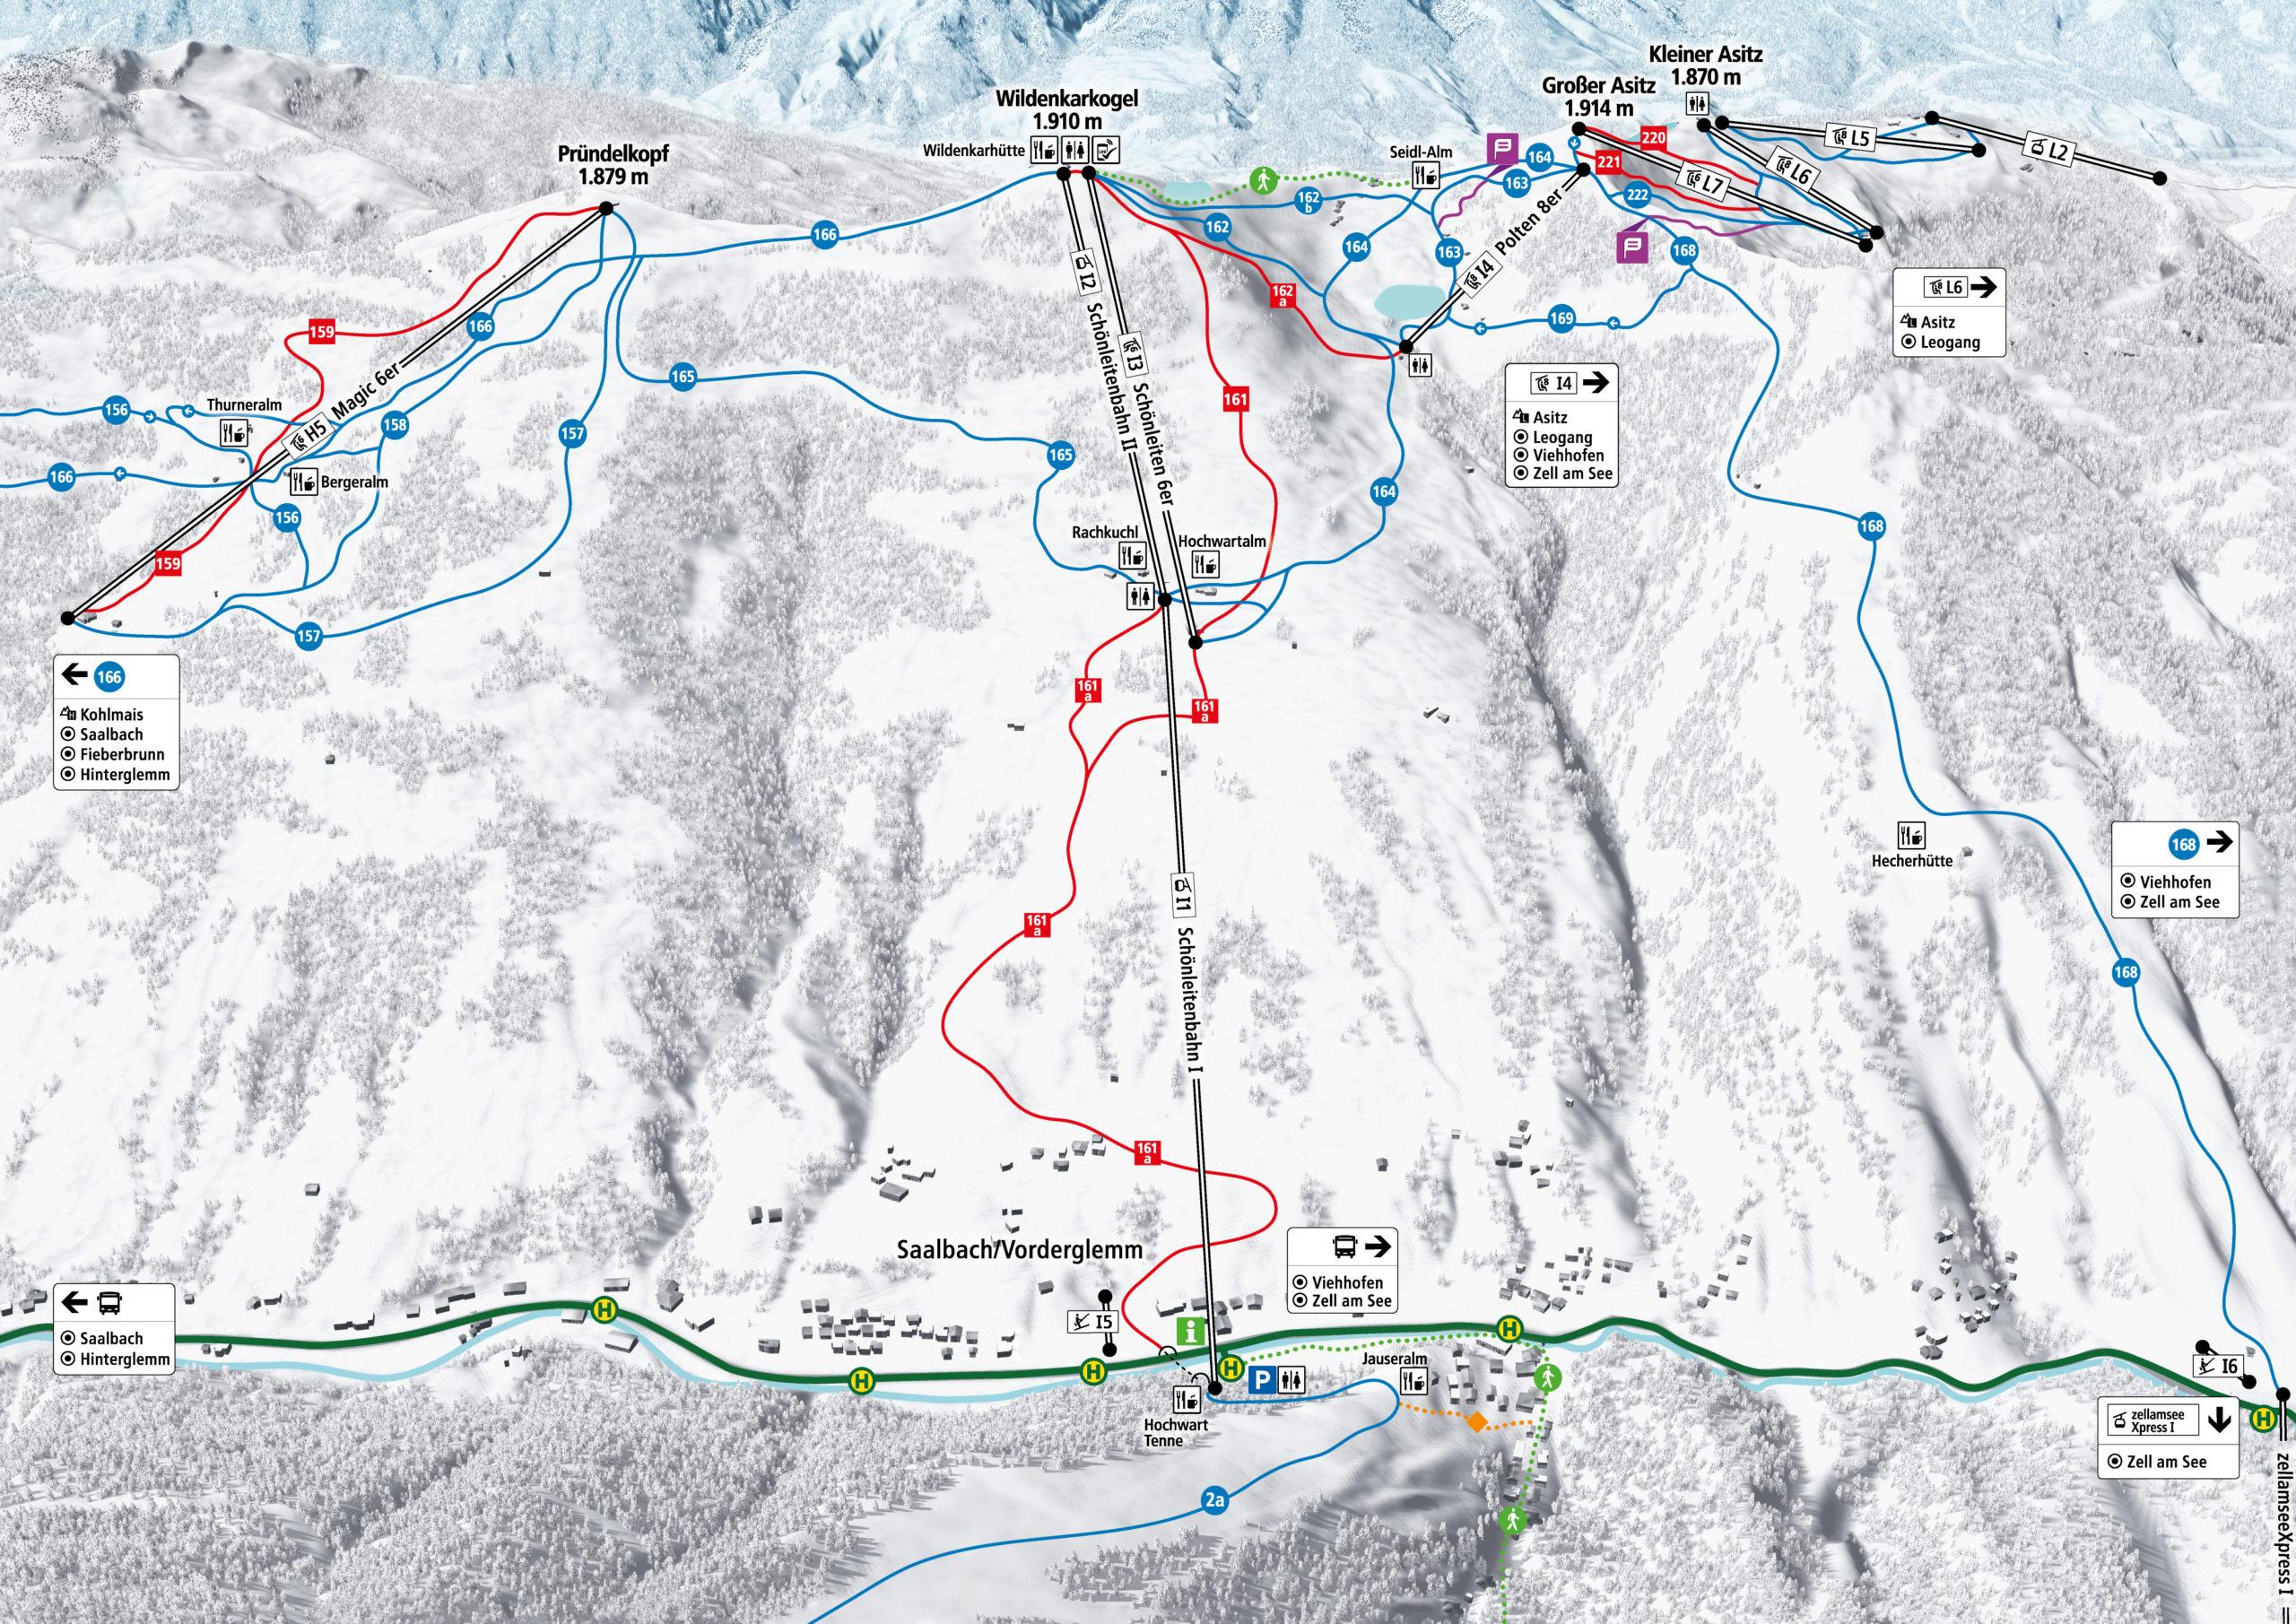 3D Pistenplan und Panoramakarte Skicircus Saalbach Hinterglemm Leogang Fieberbrunn Zone I Schoenleiten